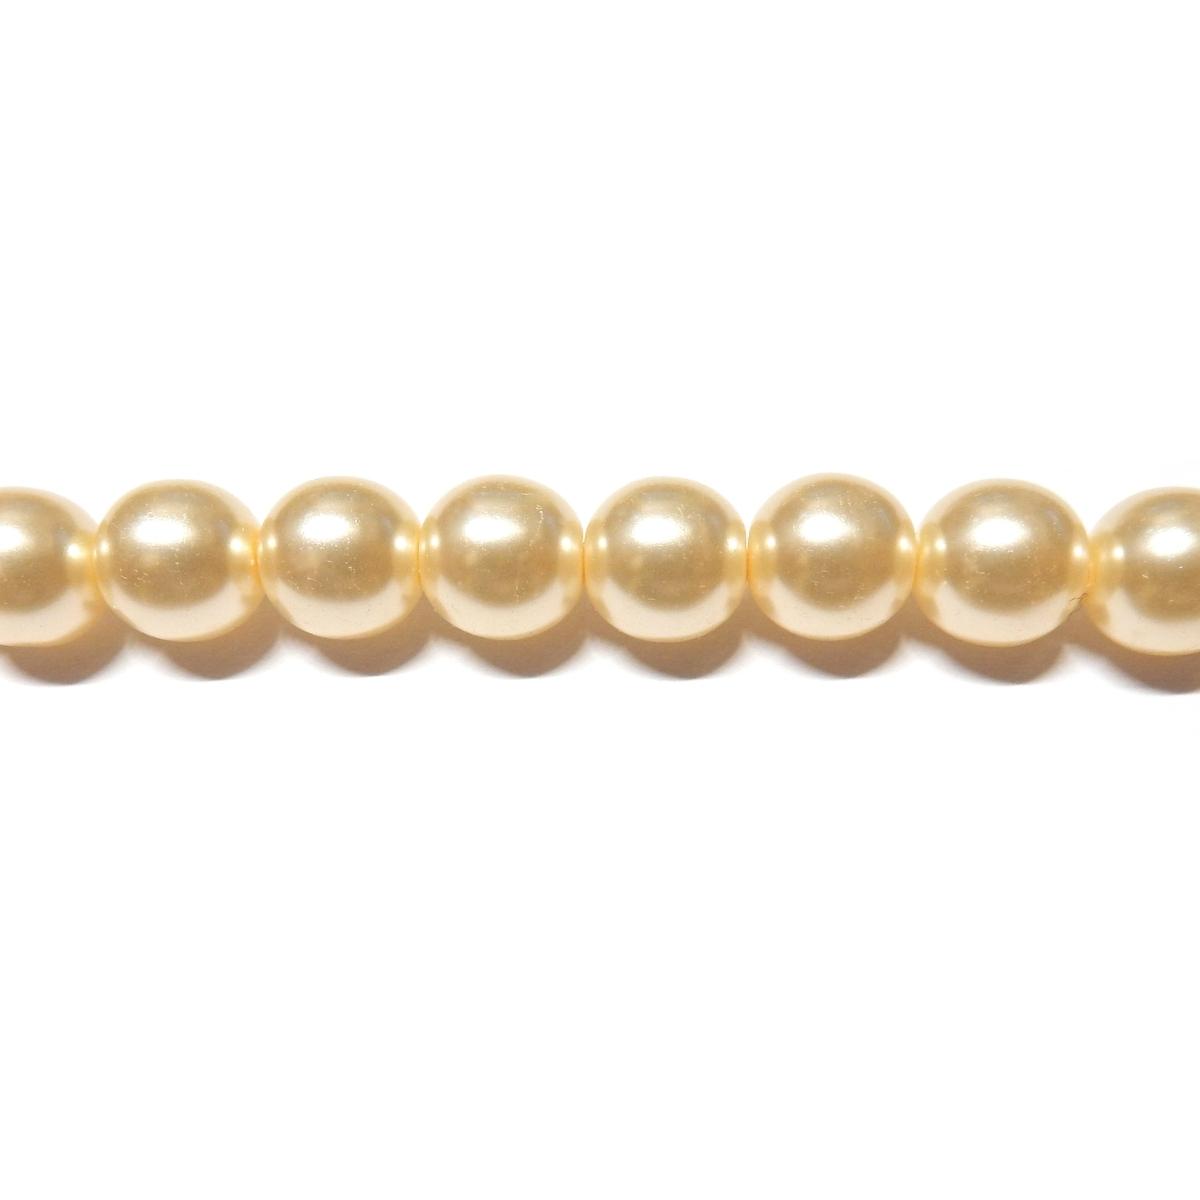 Round Glass Pearls 8mm - Cream Colour